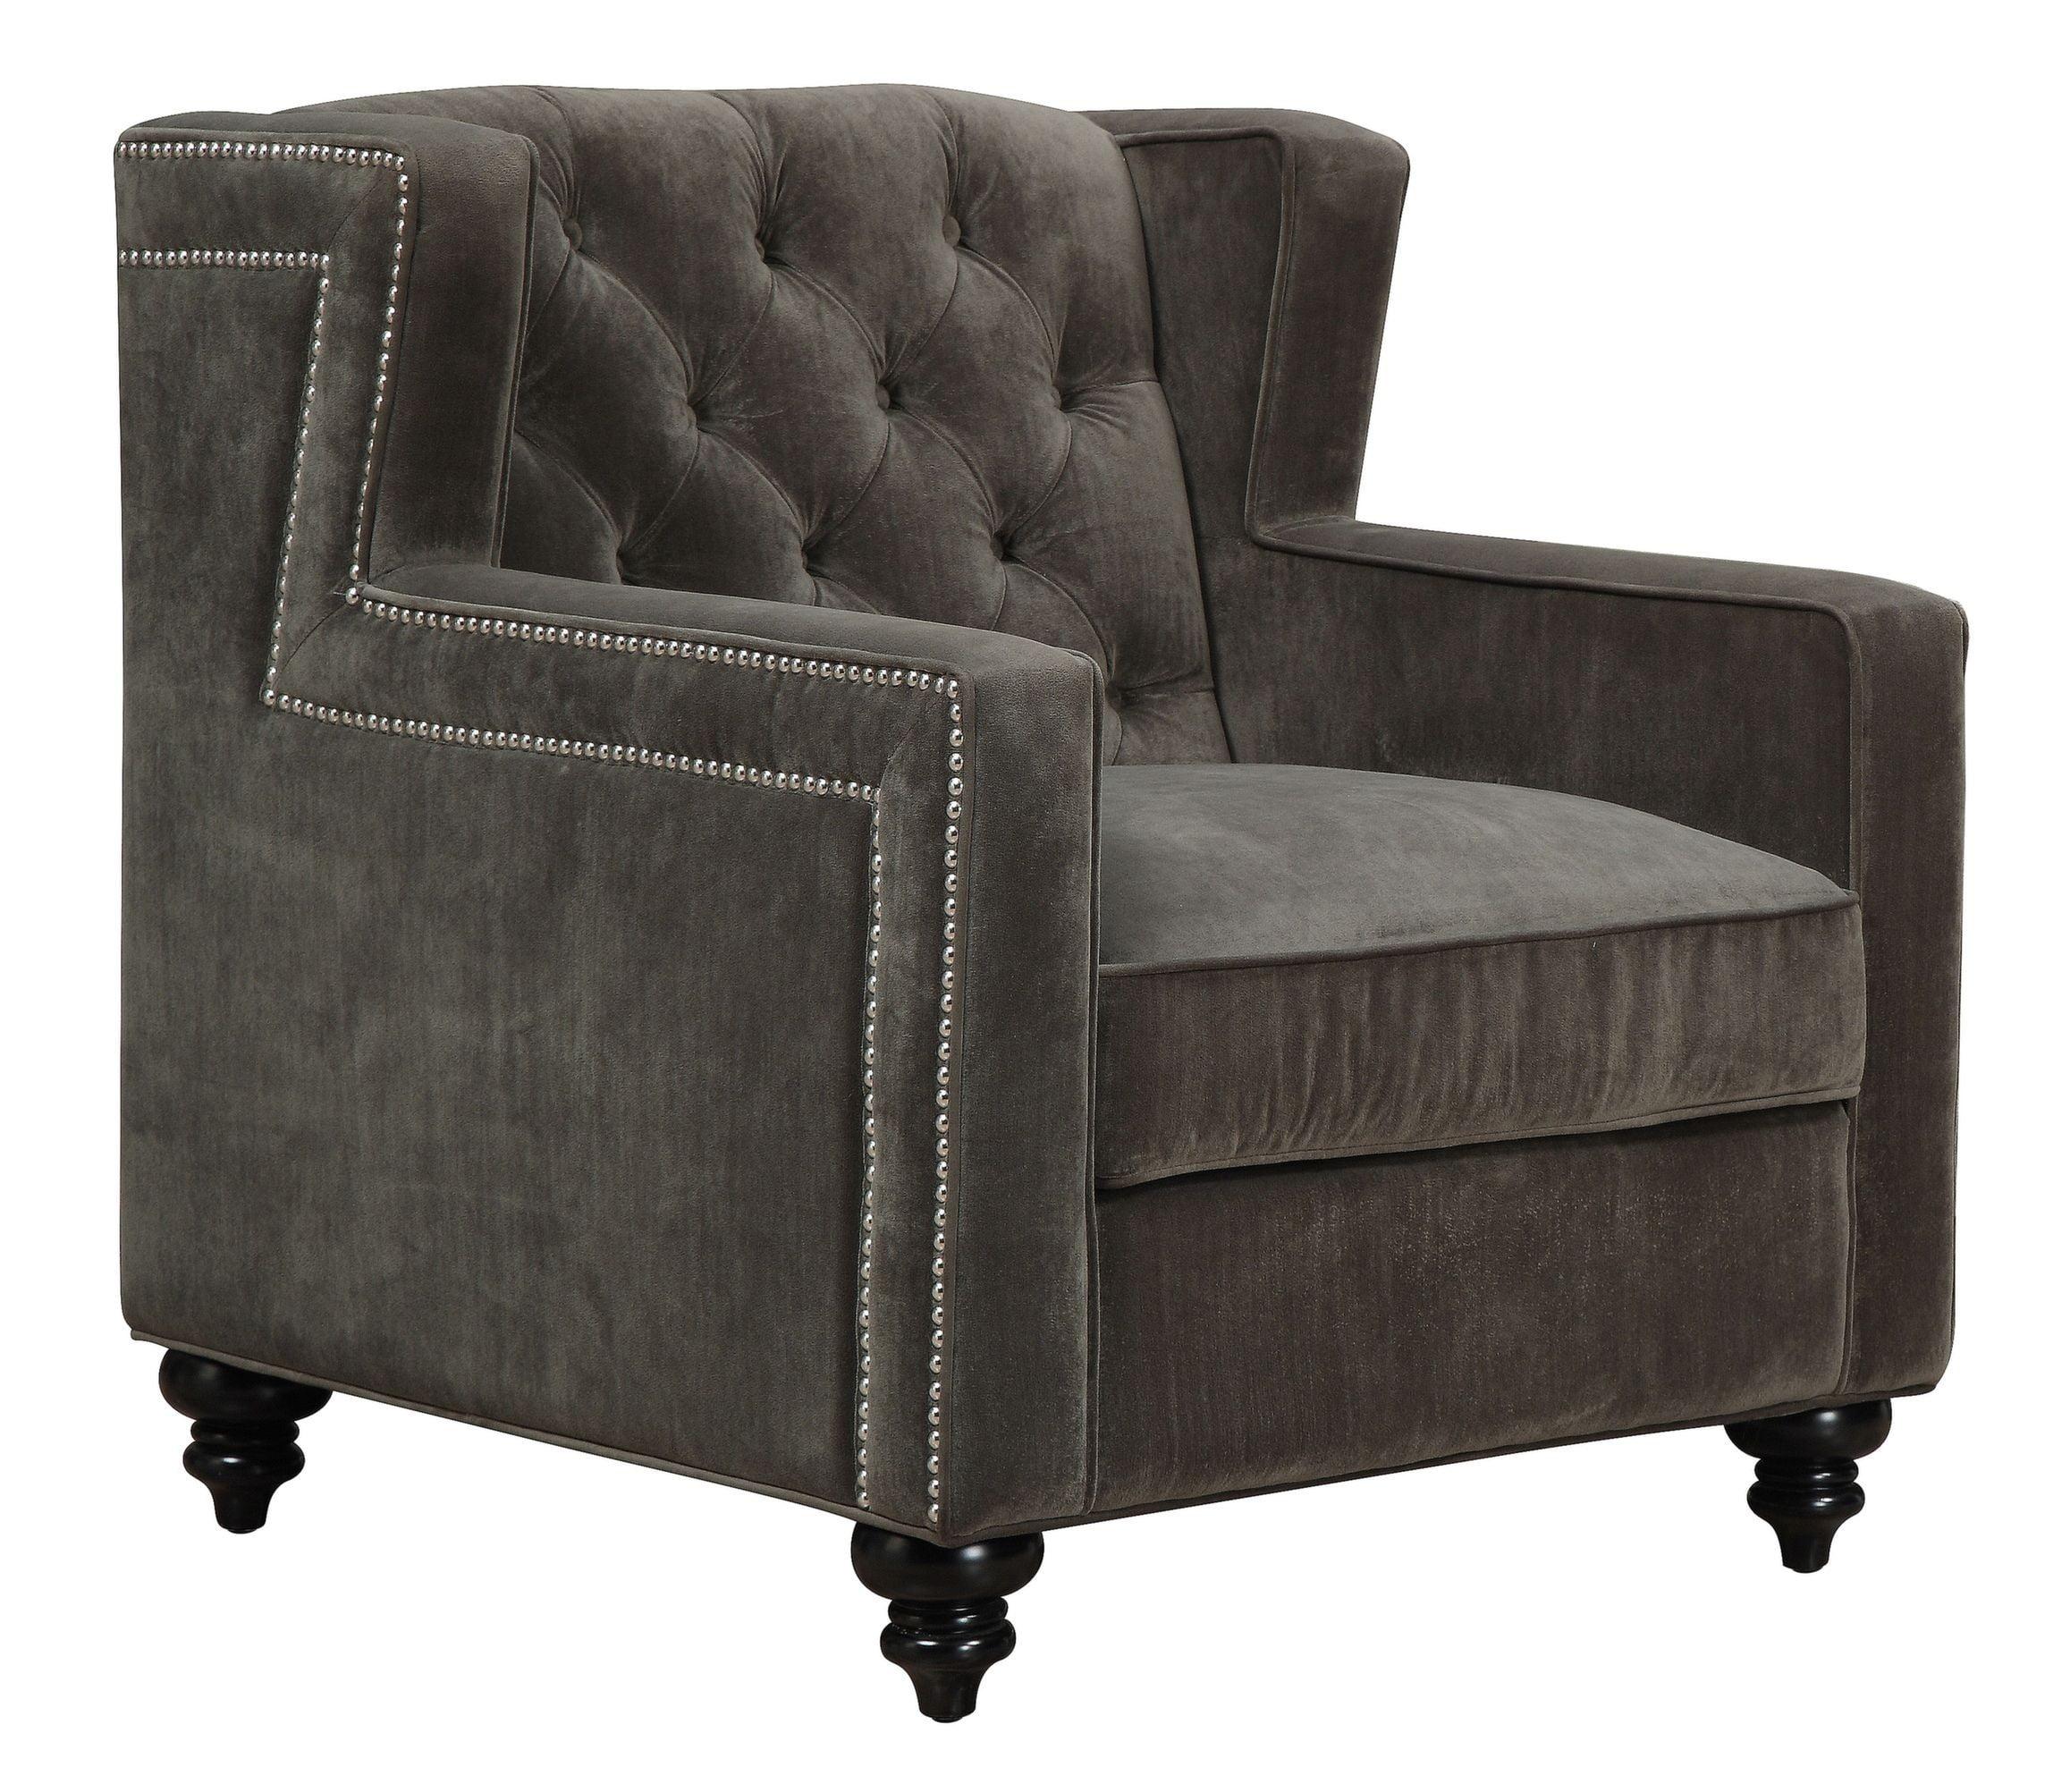 Sydney Pewter Velvet Chair From TOV C63 Coleman Furniture